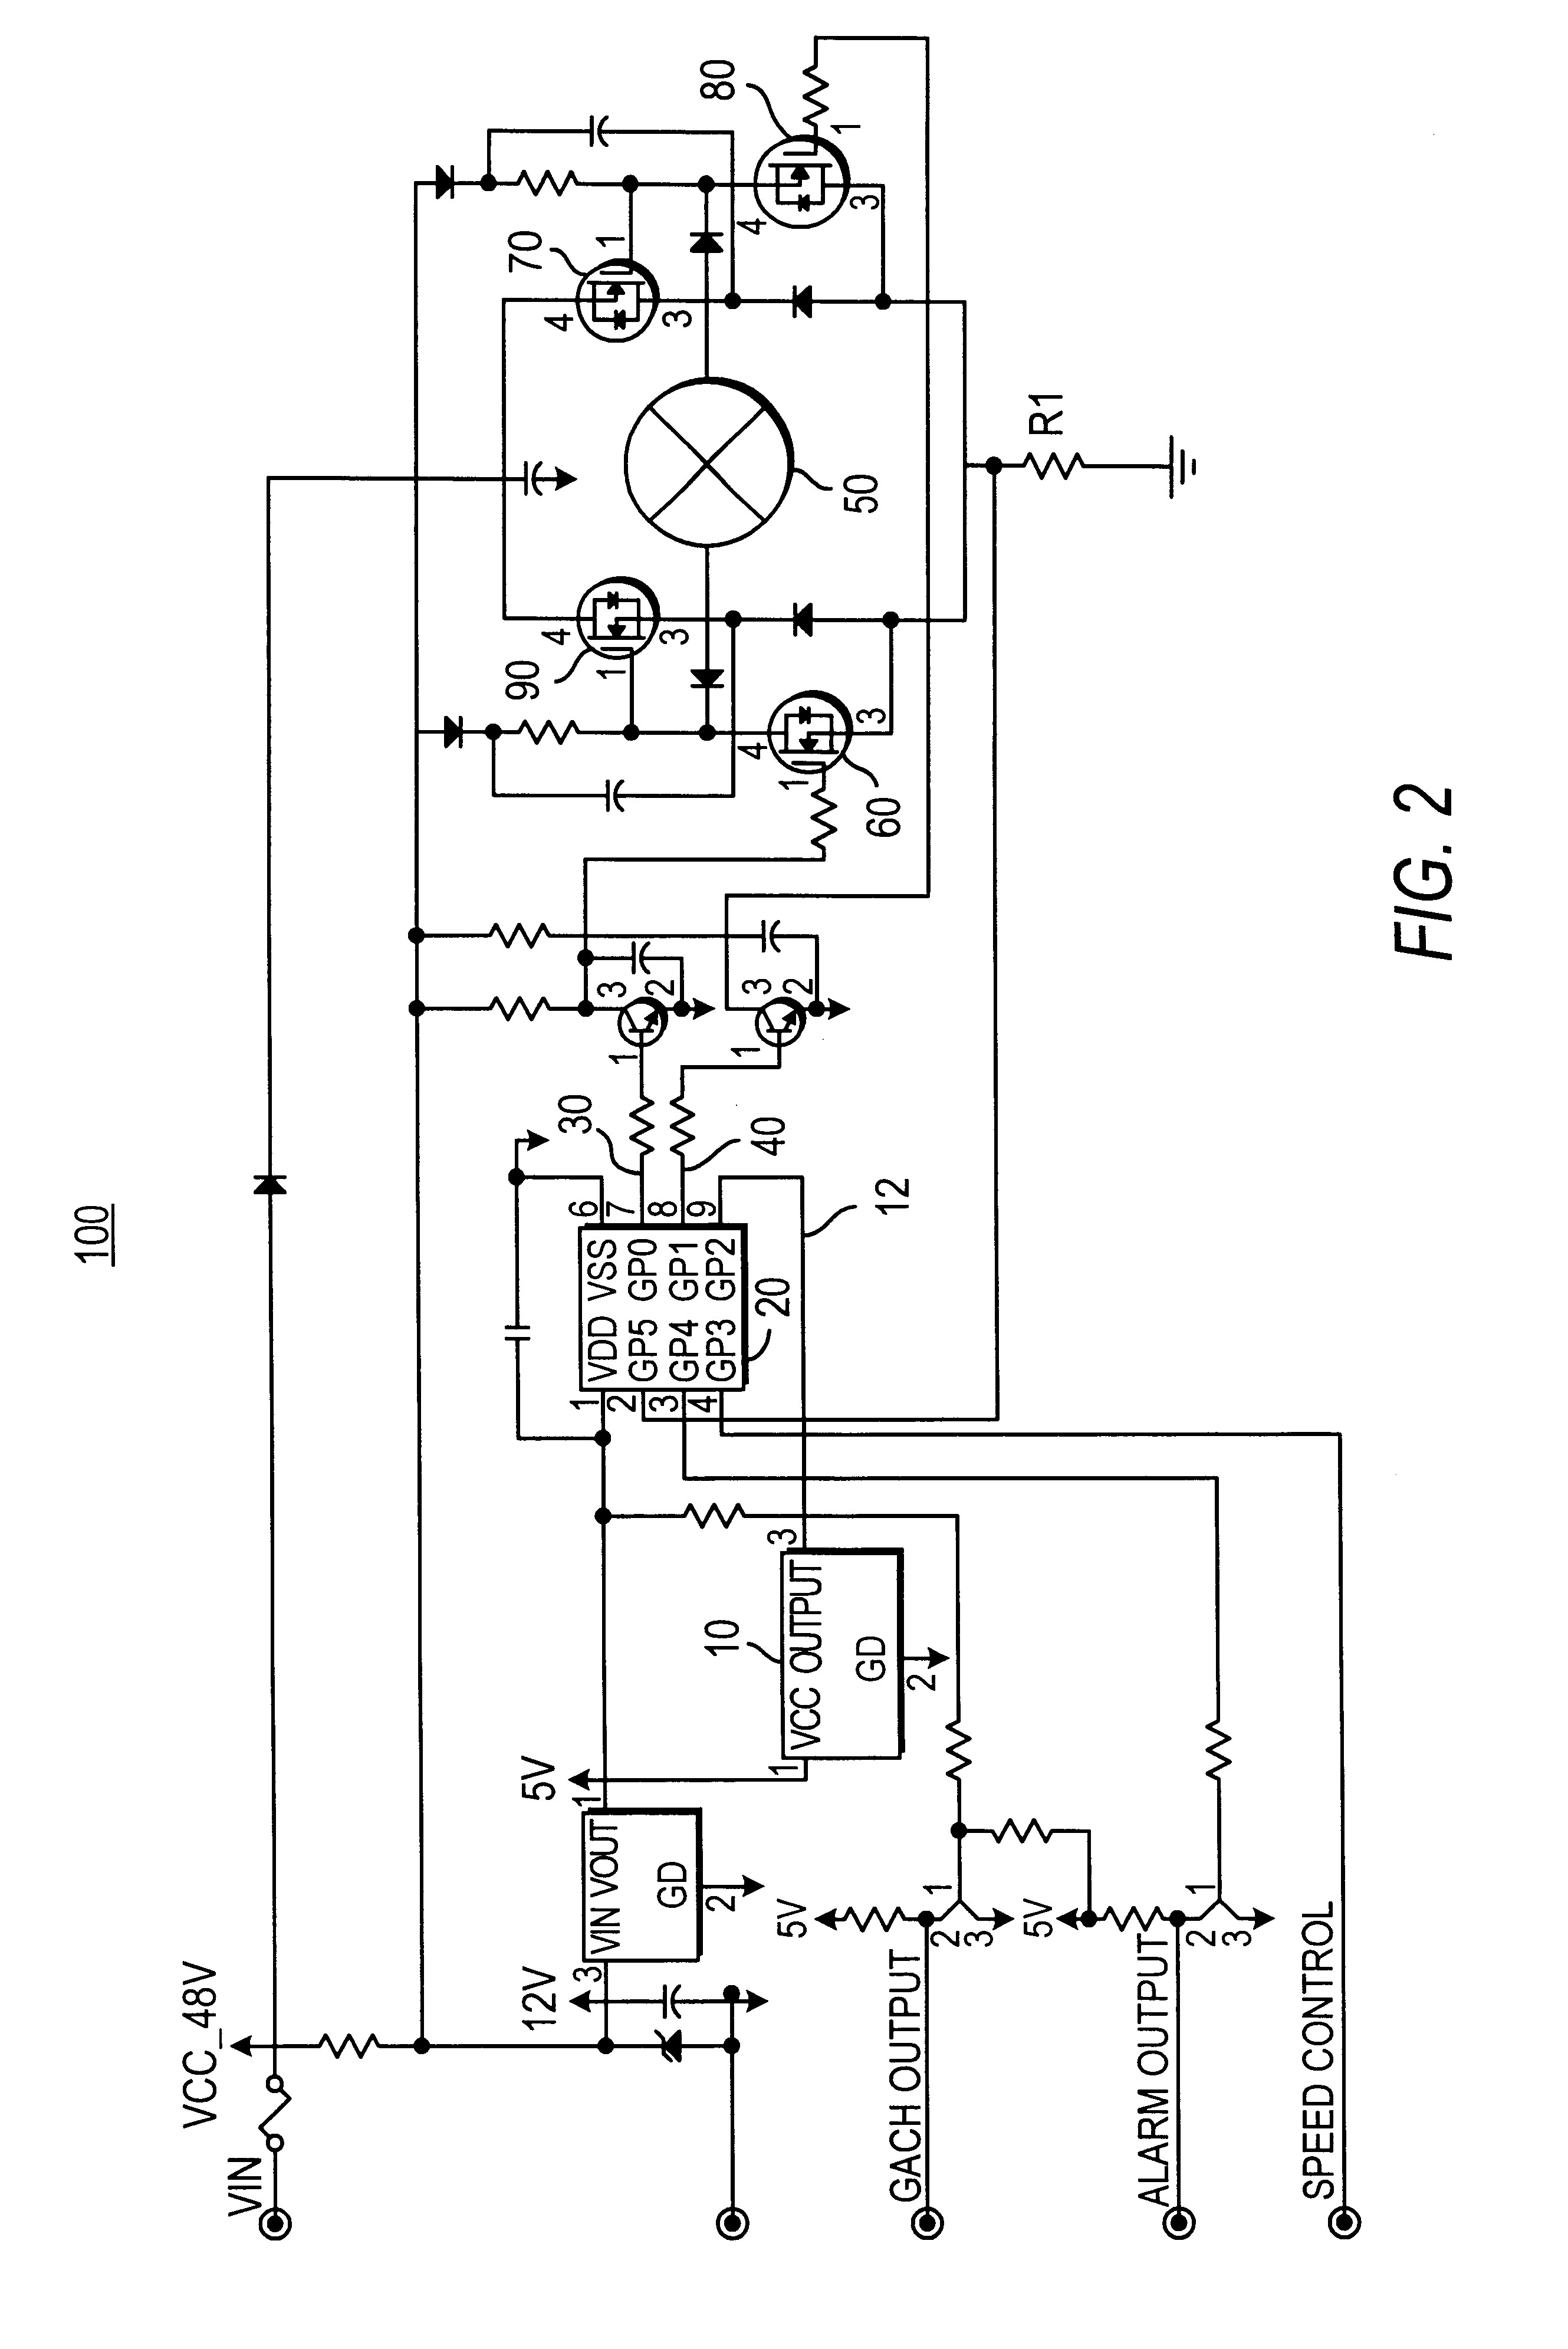 Motor Wiring Diagram 3 Phase Patent Us Drive Circuit for A Brushless Dc Motor Google Of Motor Wiring Diagram 3 Phase